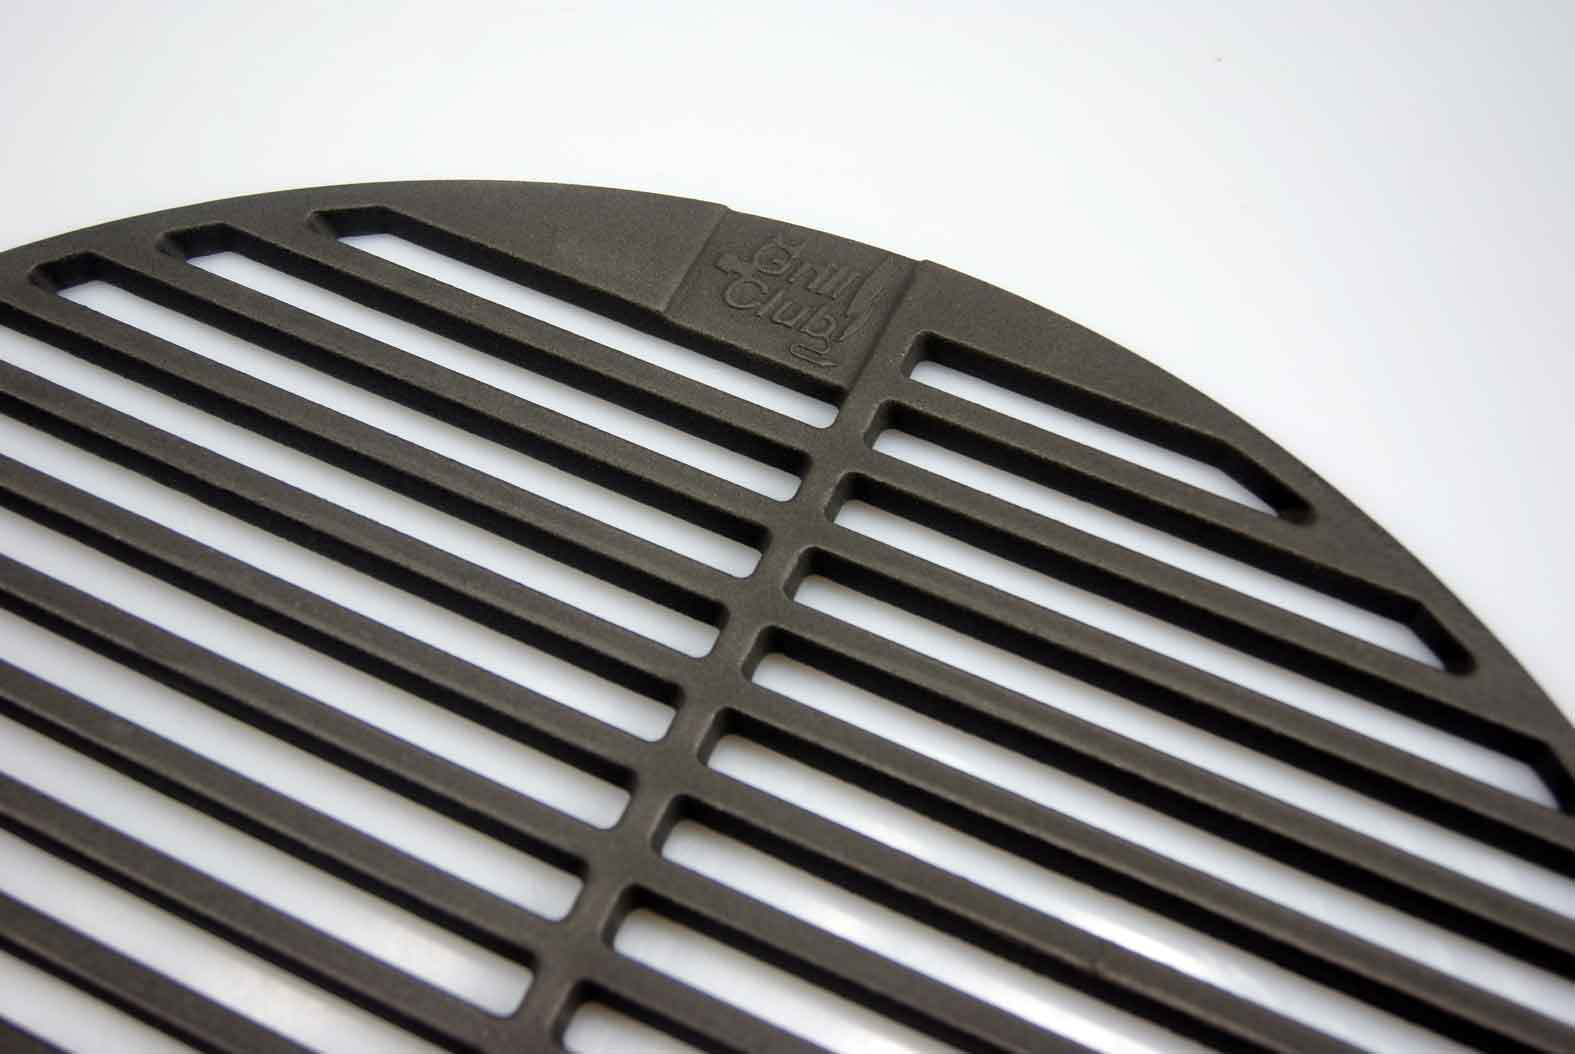 gusseisen grillrost f r 37 47 57 cm kugelgrill auch weber rund guss grill neu eur 36 90. Black Bedroom Furniture Sets. Home Design Ideas